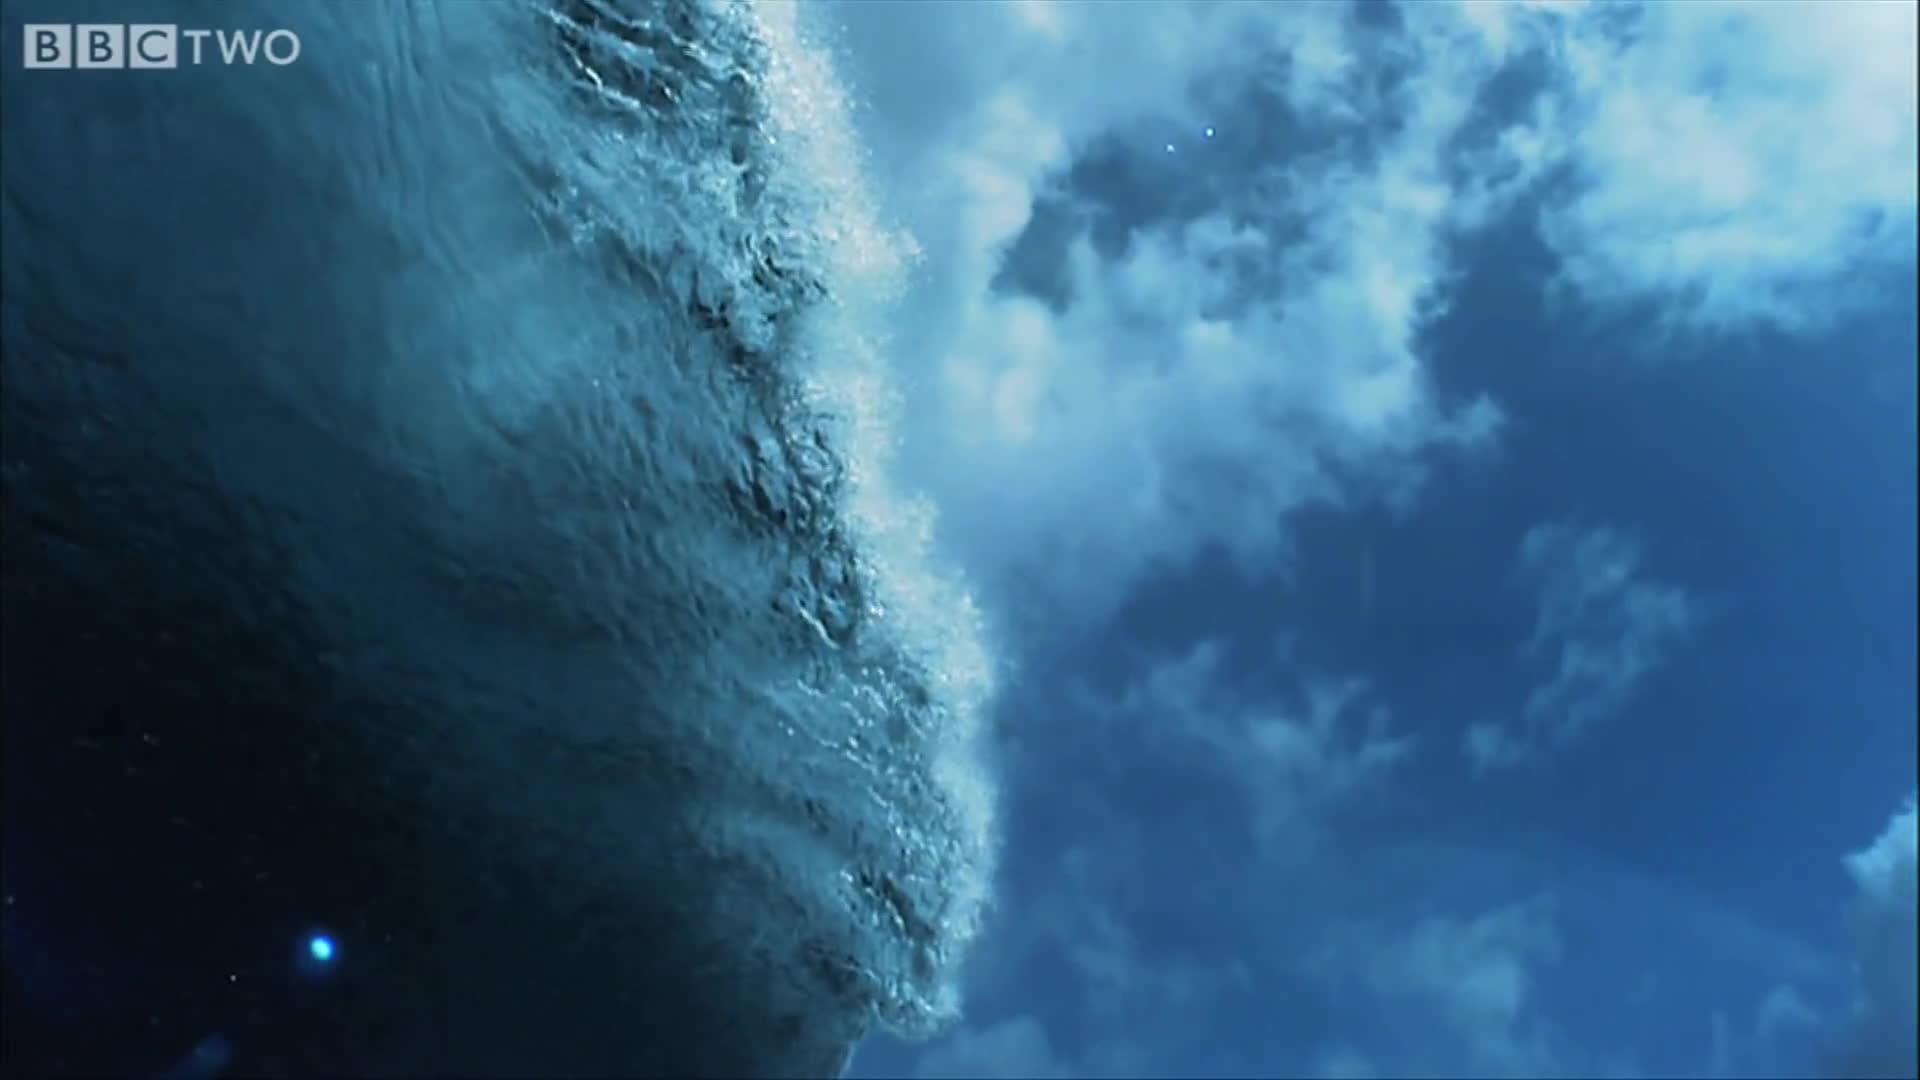 Barrel, HD, Monster, Motion, Pohnpei, Ponape, Sick, Slo, Slow, Super, Surf, Surfing, Vortice, Vortices, Waves, mo, wave, surfing GIFs